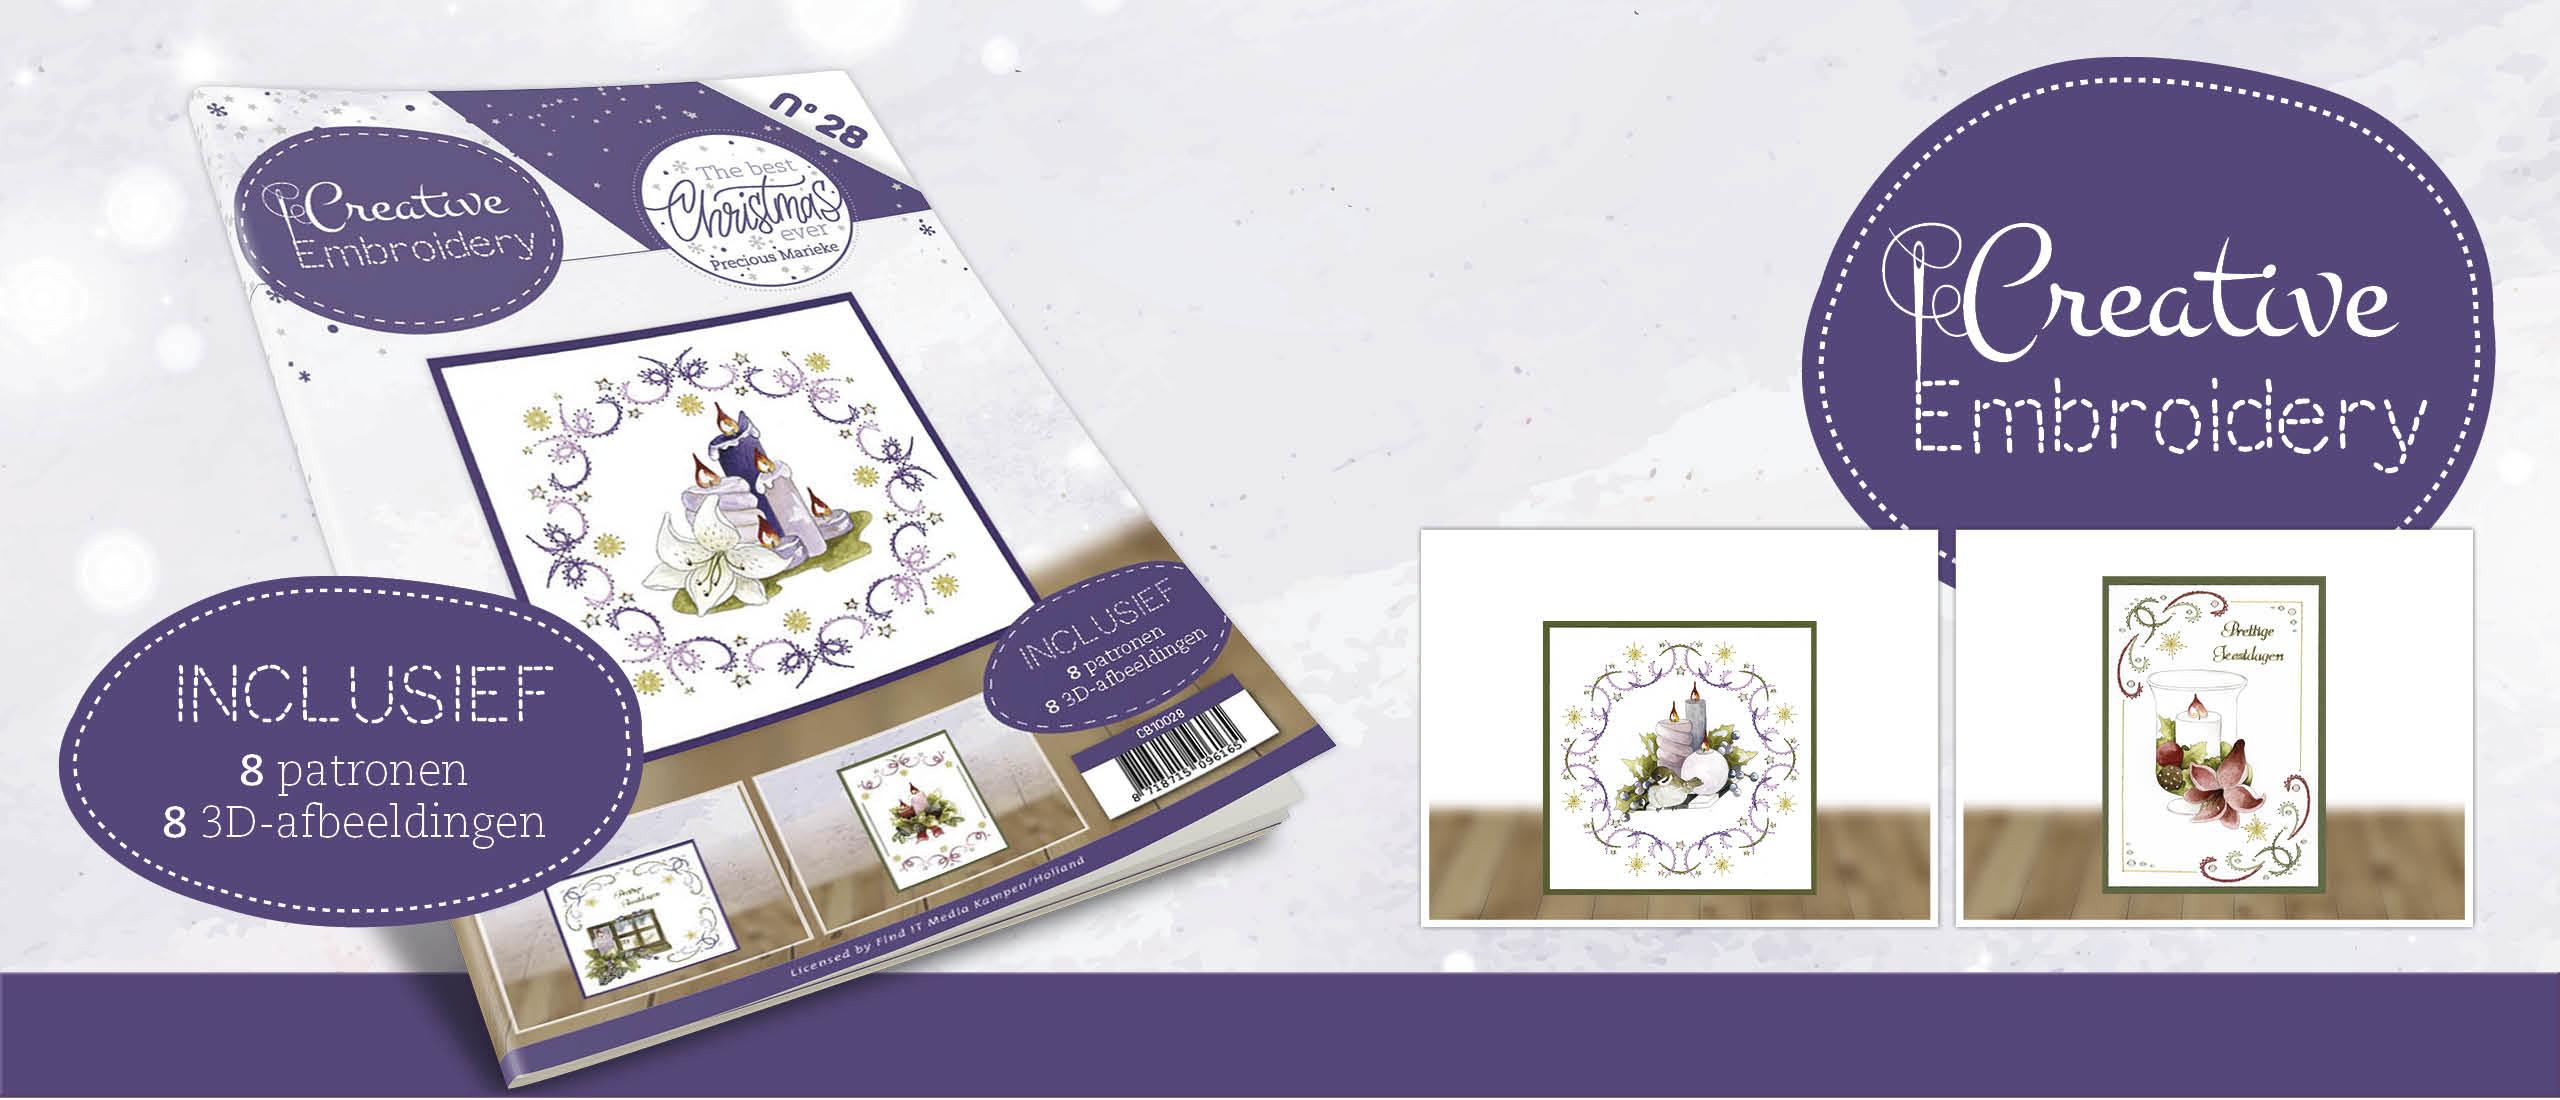 Creative Embroidery 28 - Precious Marieke- The Best Christmas Ever